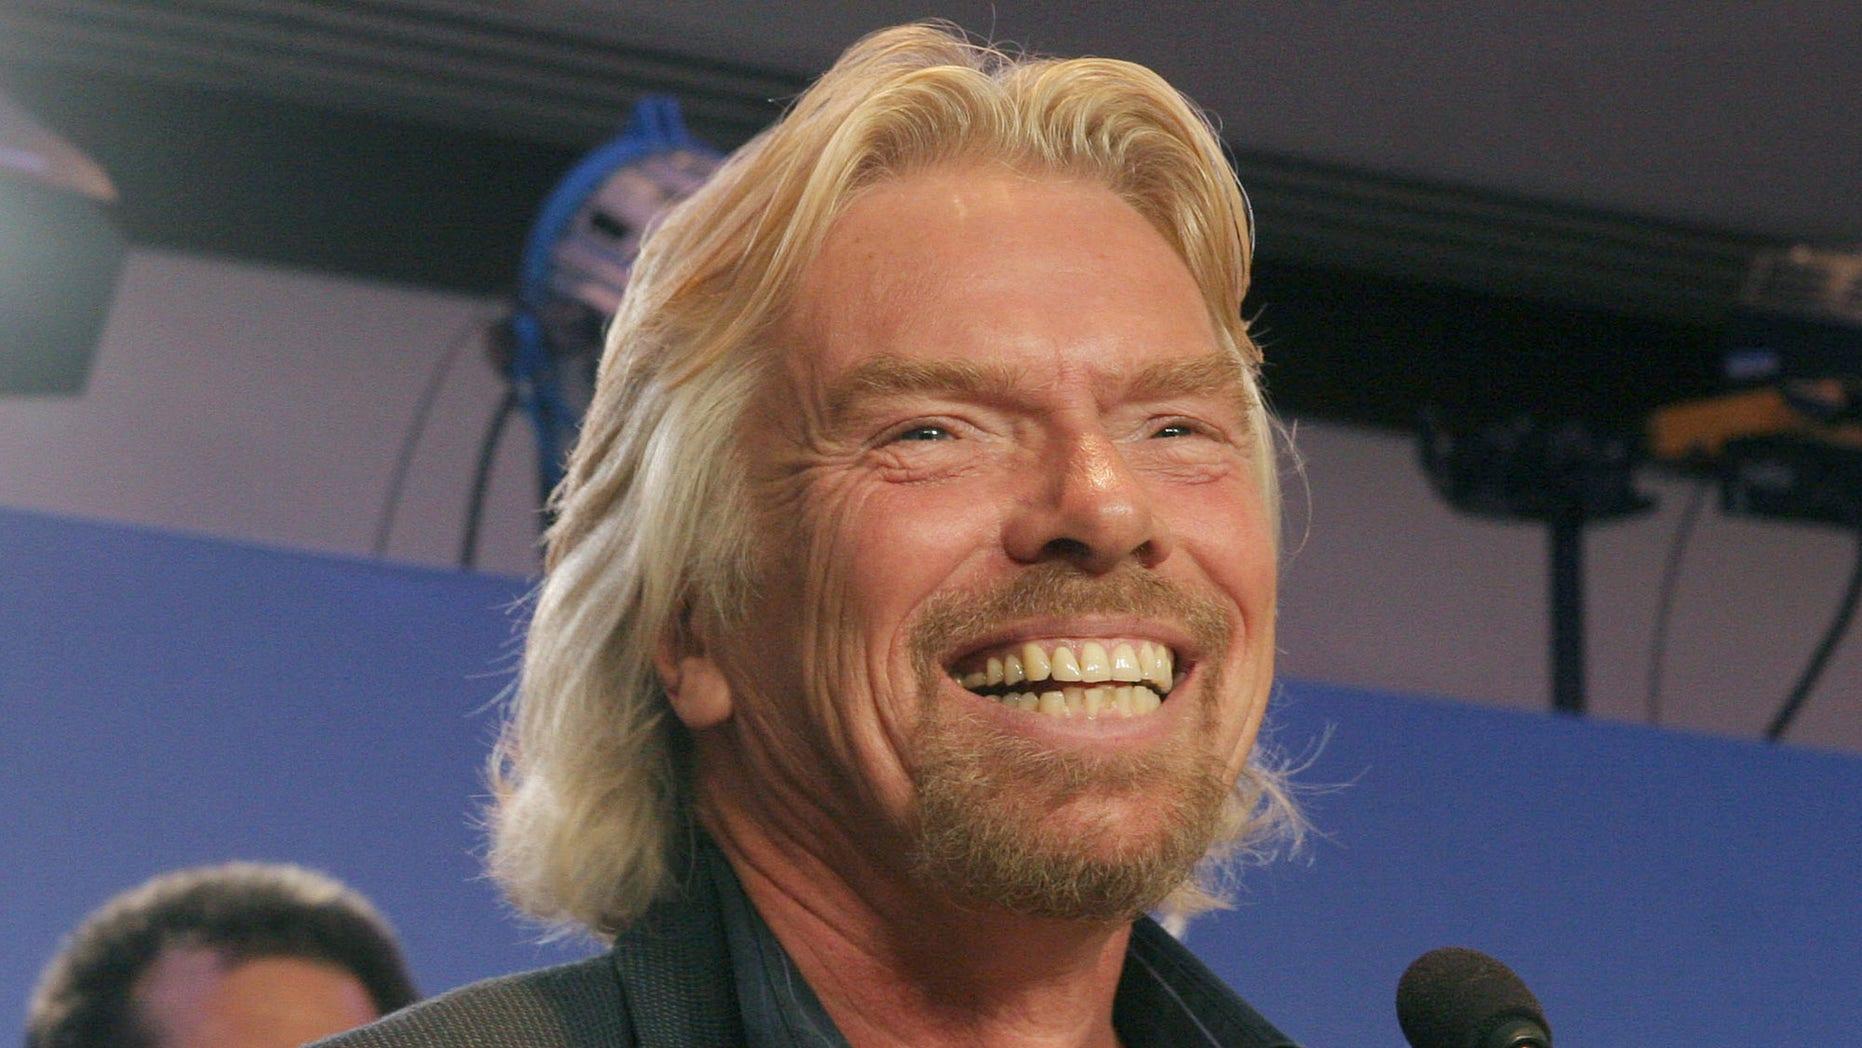 Richard Branson revealed a UN statement that would have called for drug decriminalization. (AP Photo/Tina Fineberg)